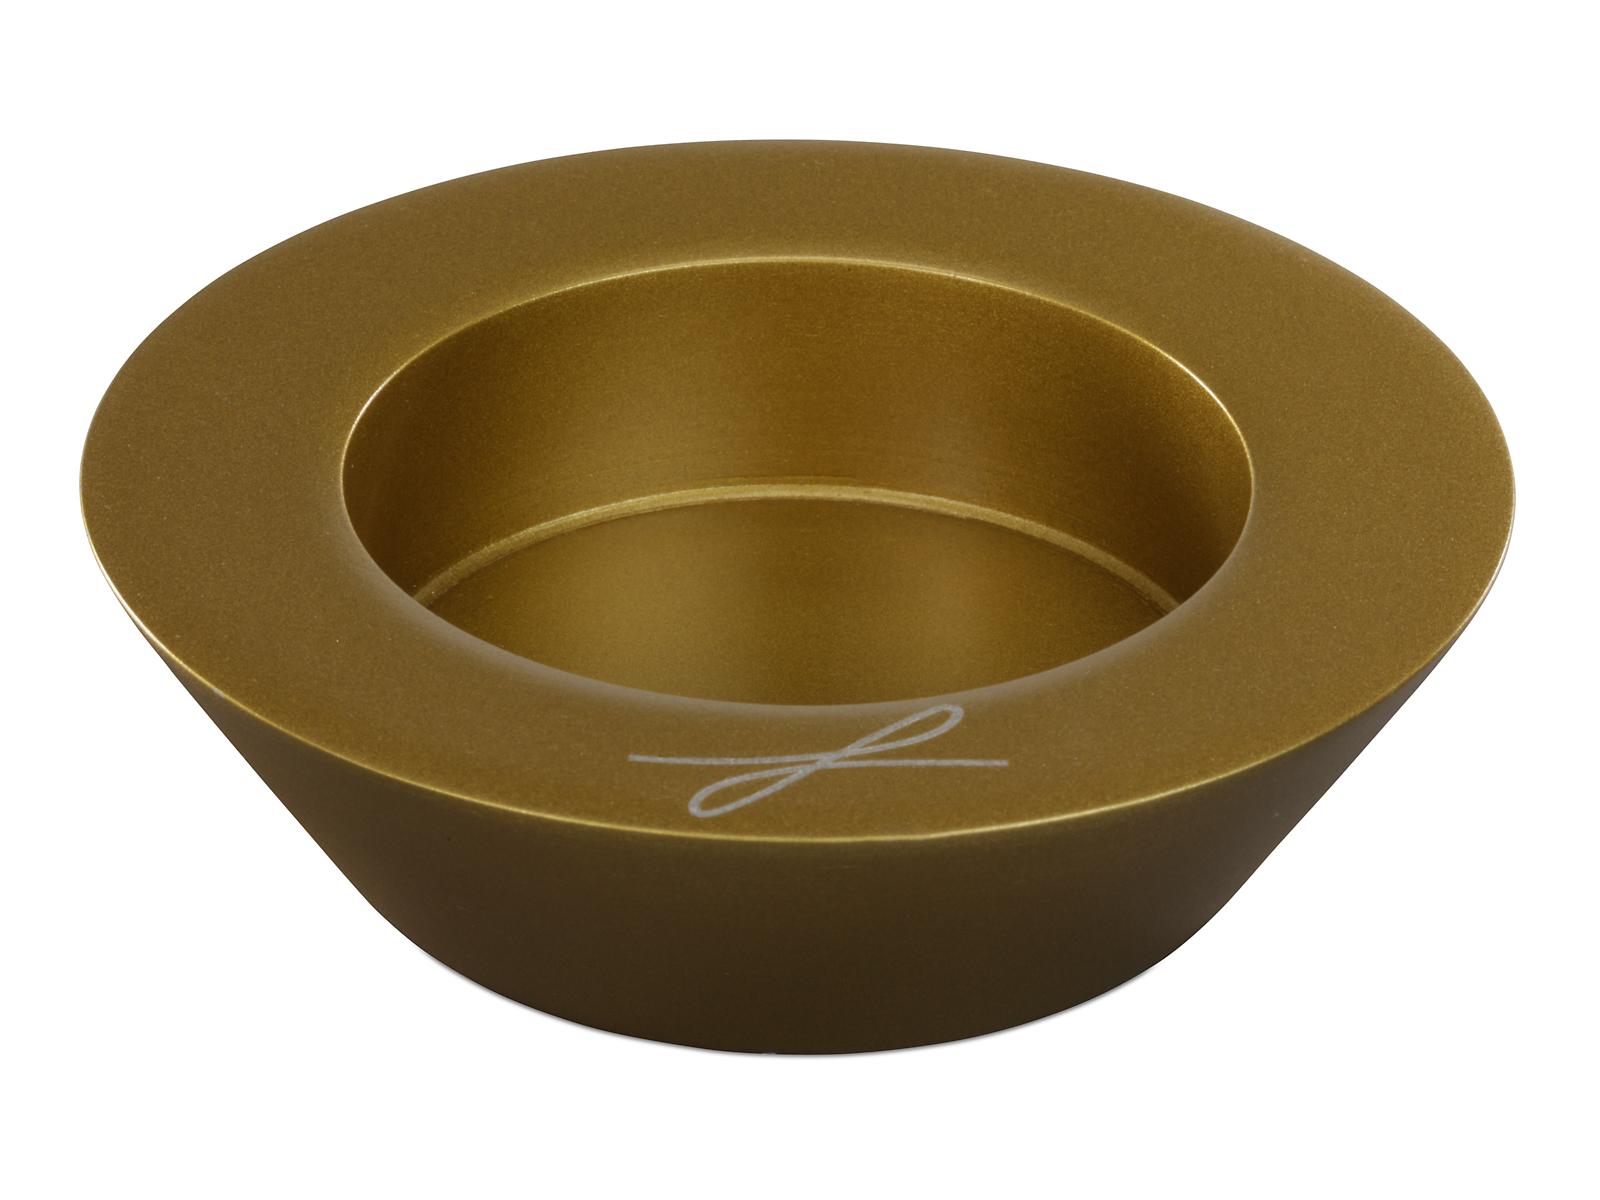 kerzenhalter aluminium goldfarben f r kerzen 6 cm. Black Bedroom Furniture Sets. Home Design Ideas